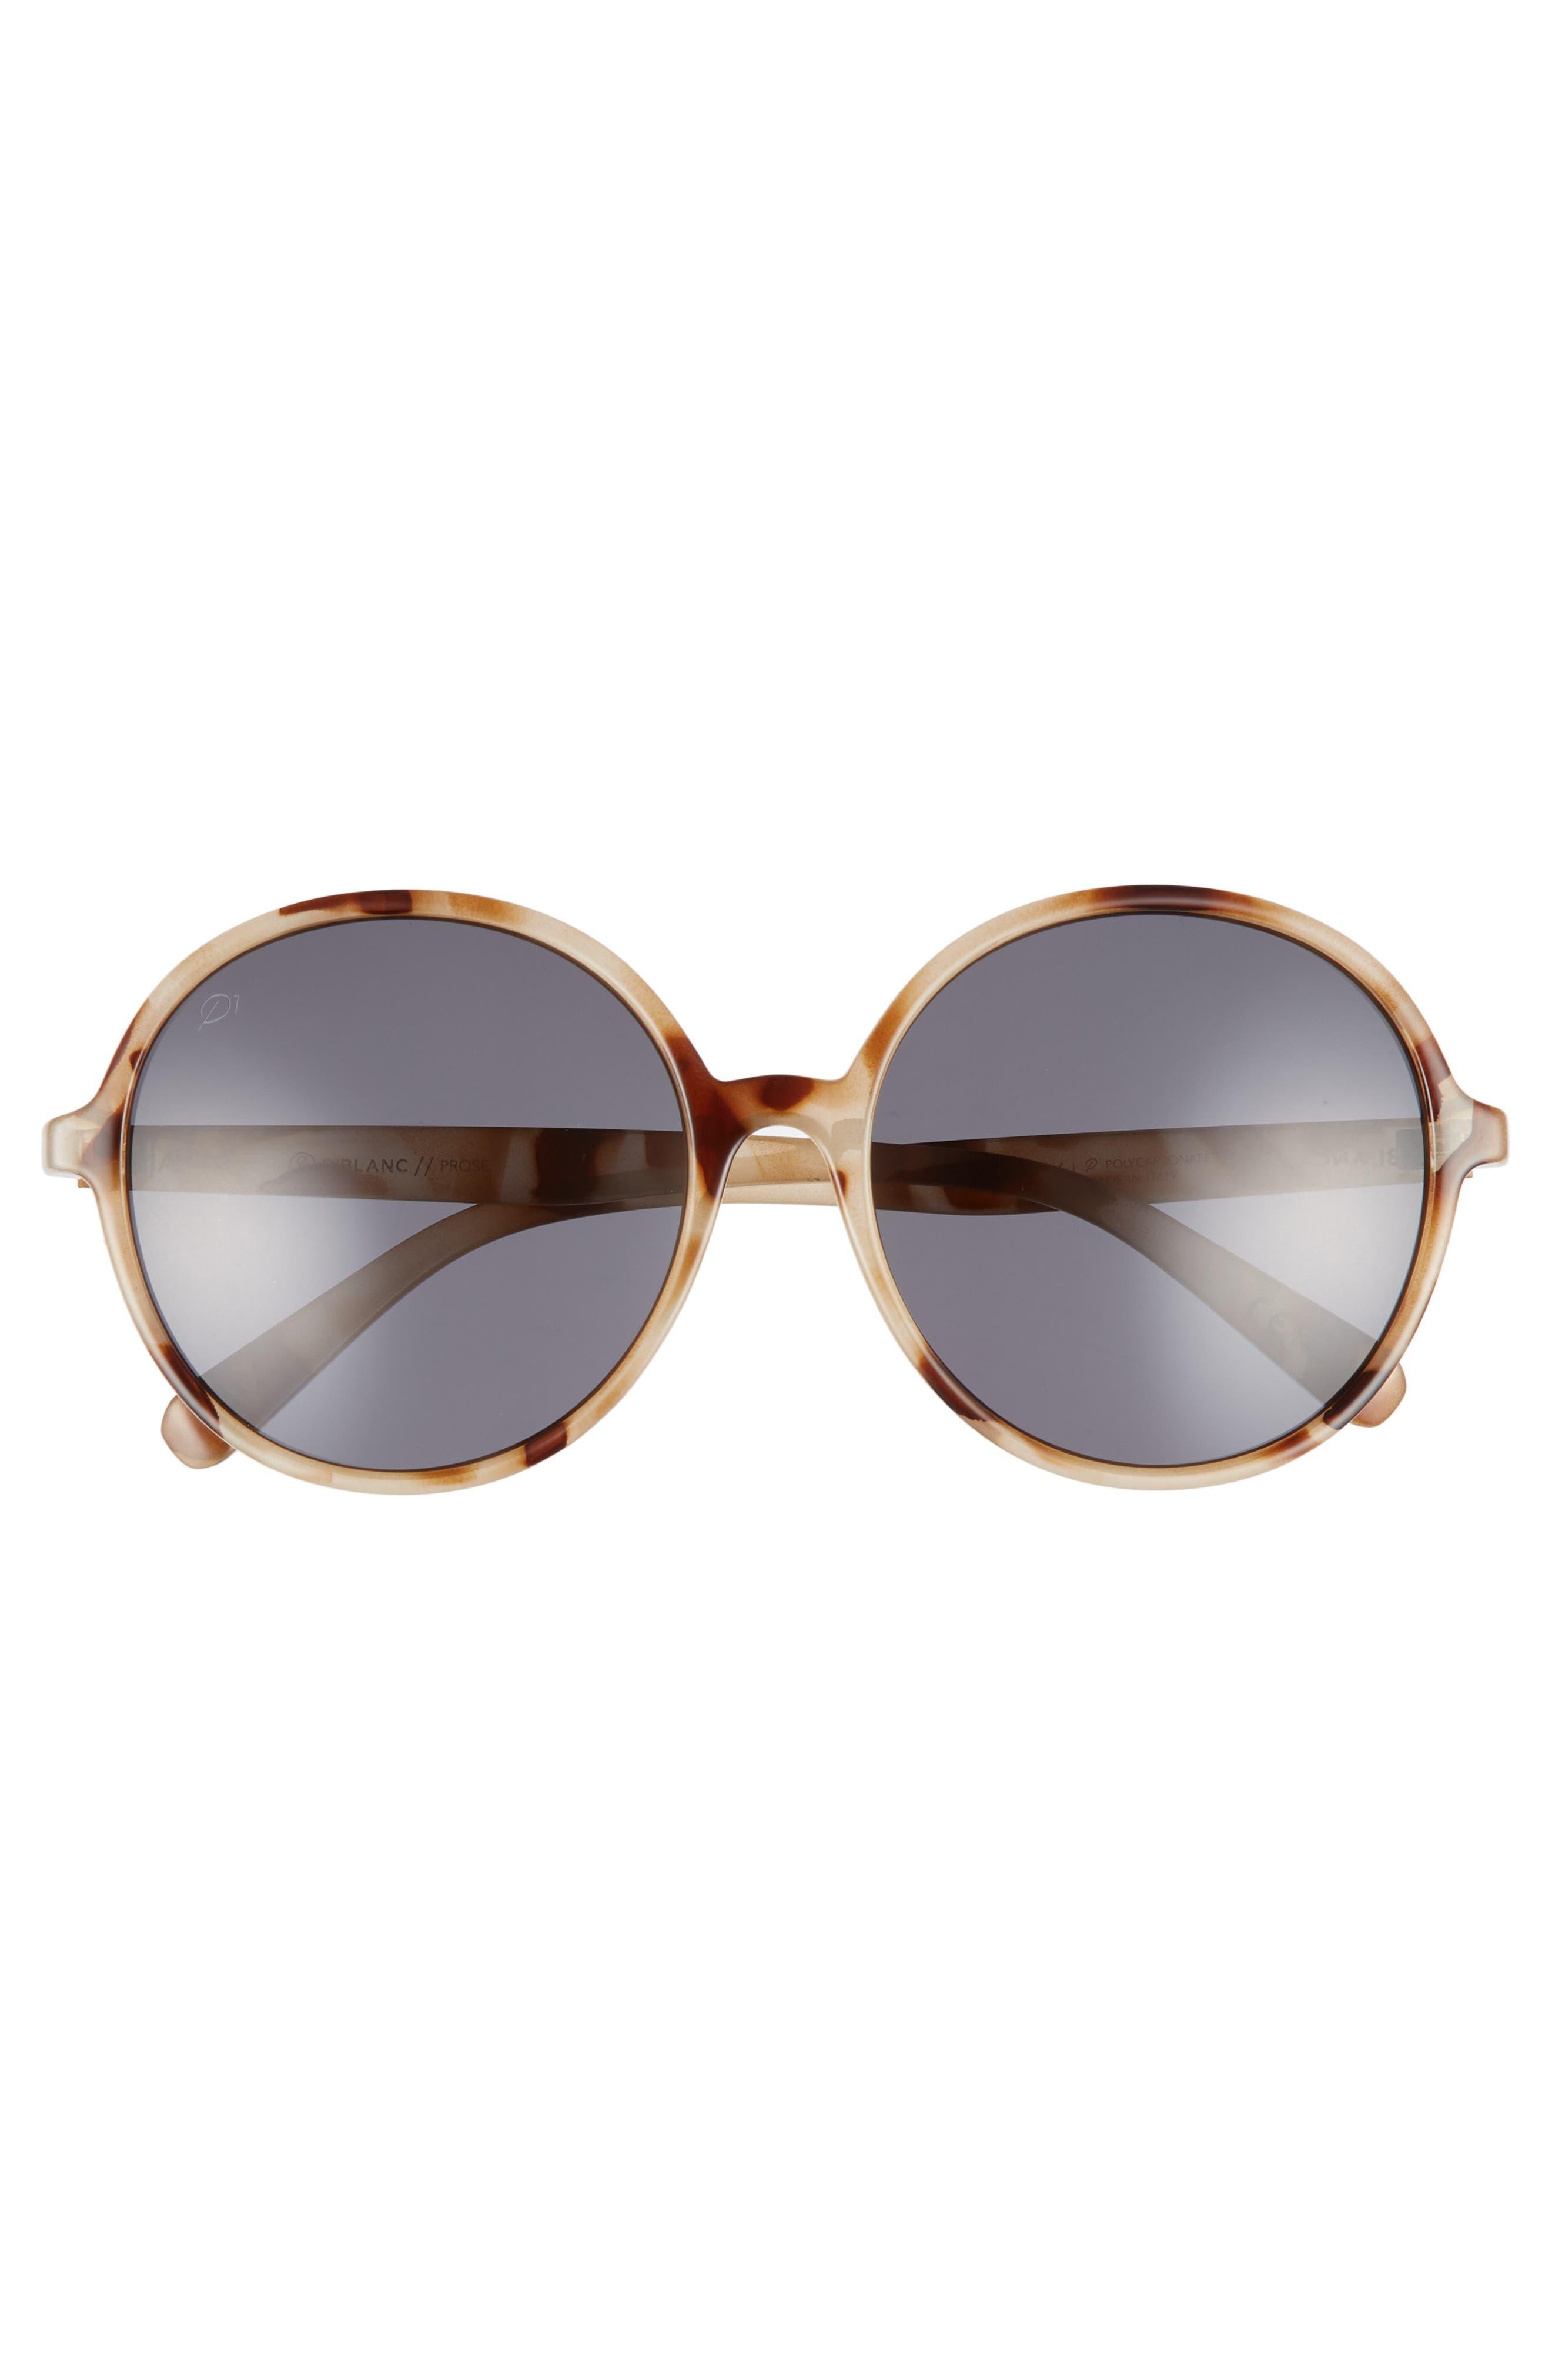 D'BLANC Prose 59mm Round Sunglasses,                             Alternate thumbnail 3, color,                             SNOW LEOPARD/ GREY POLAR